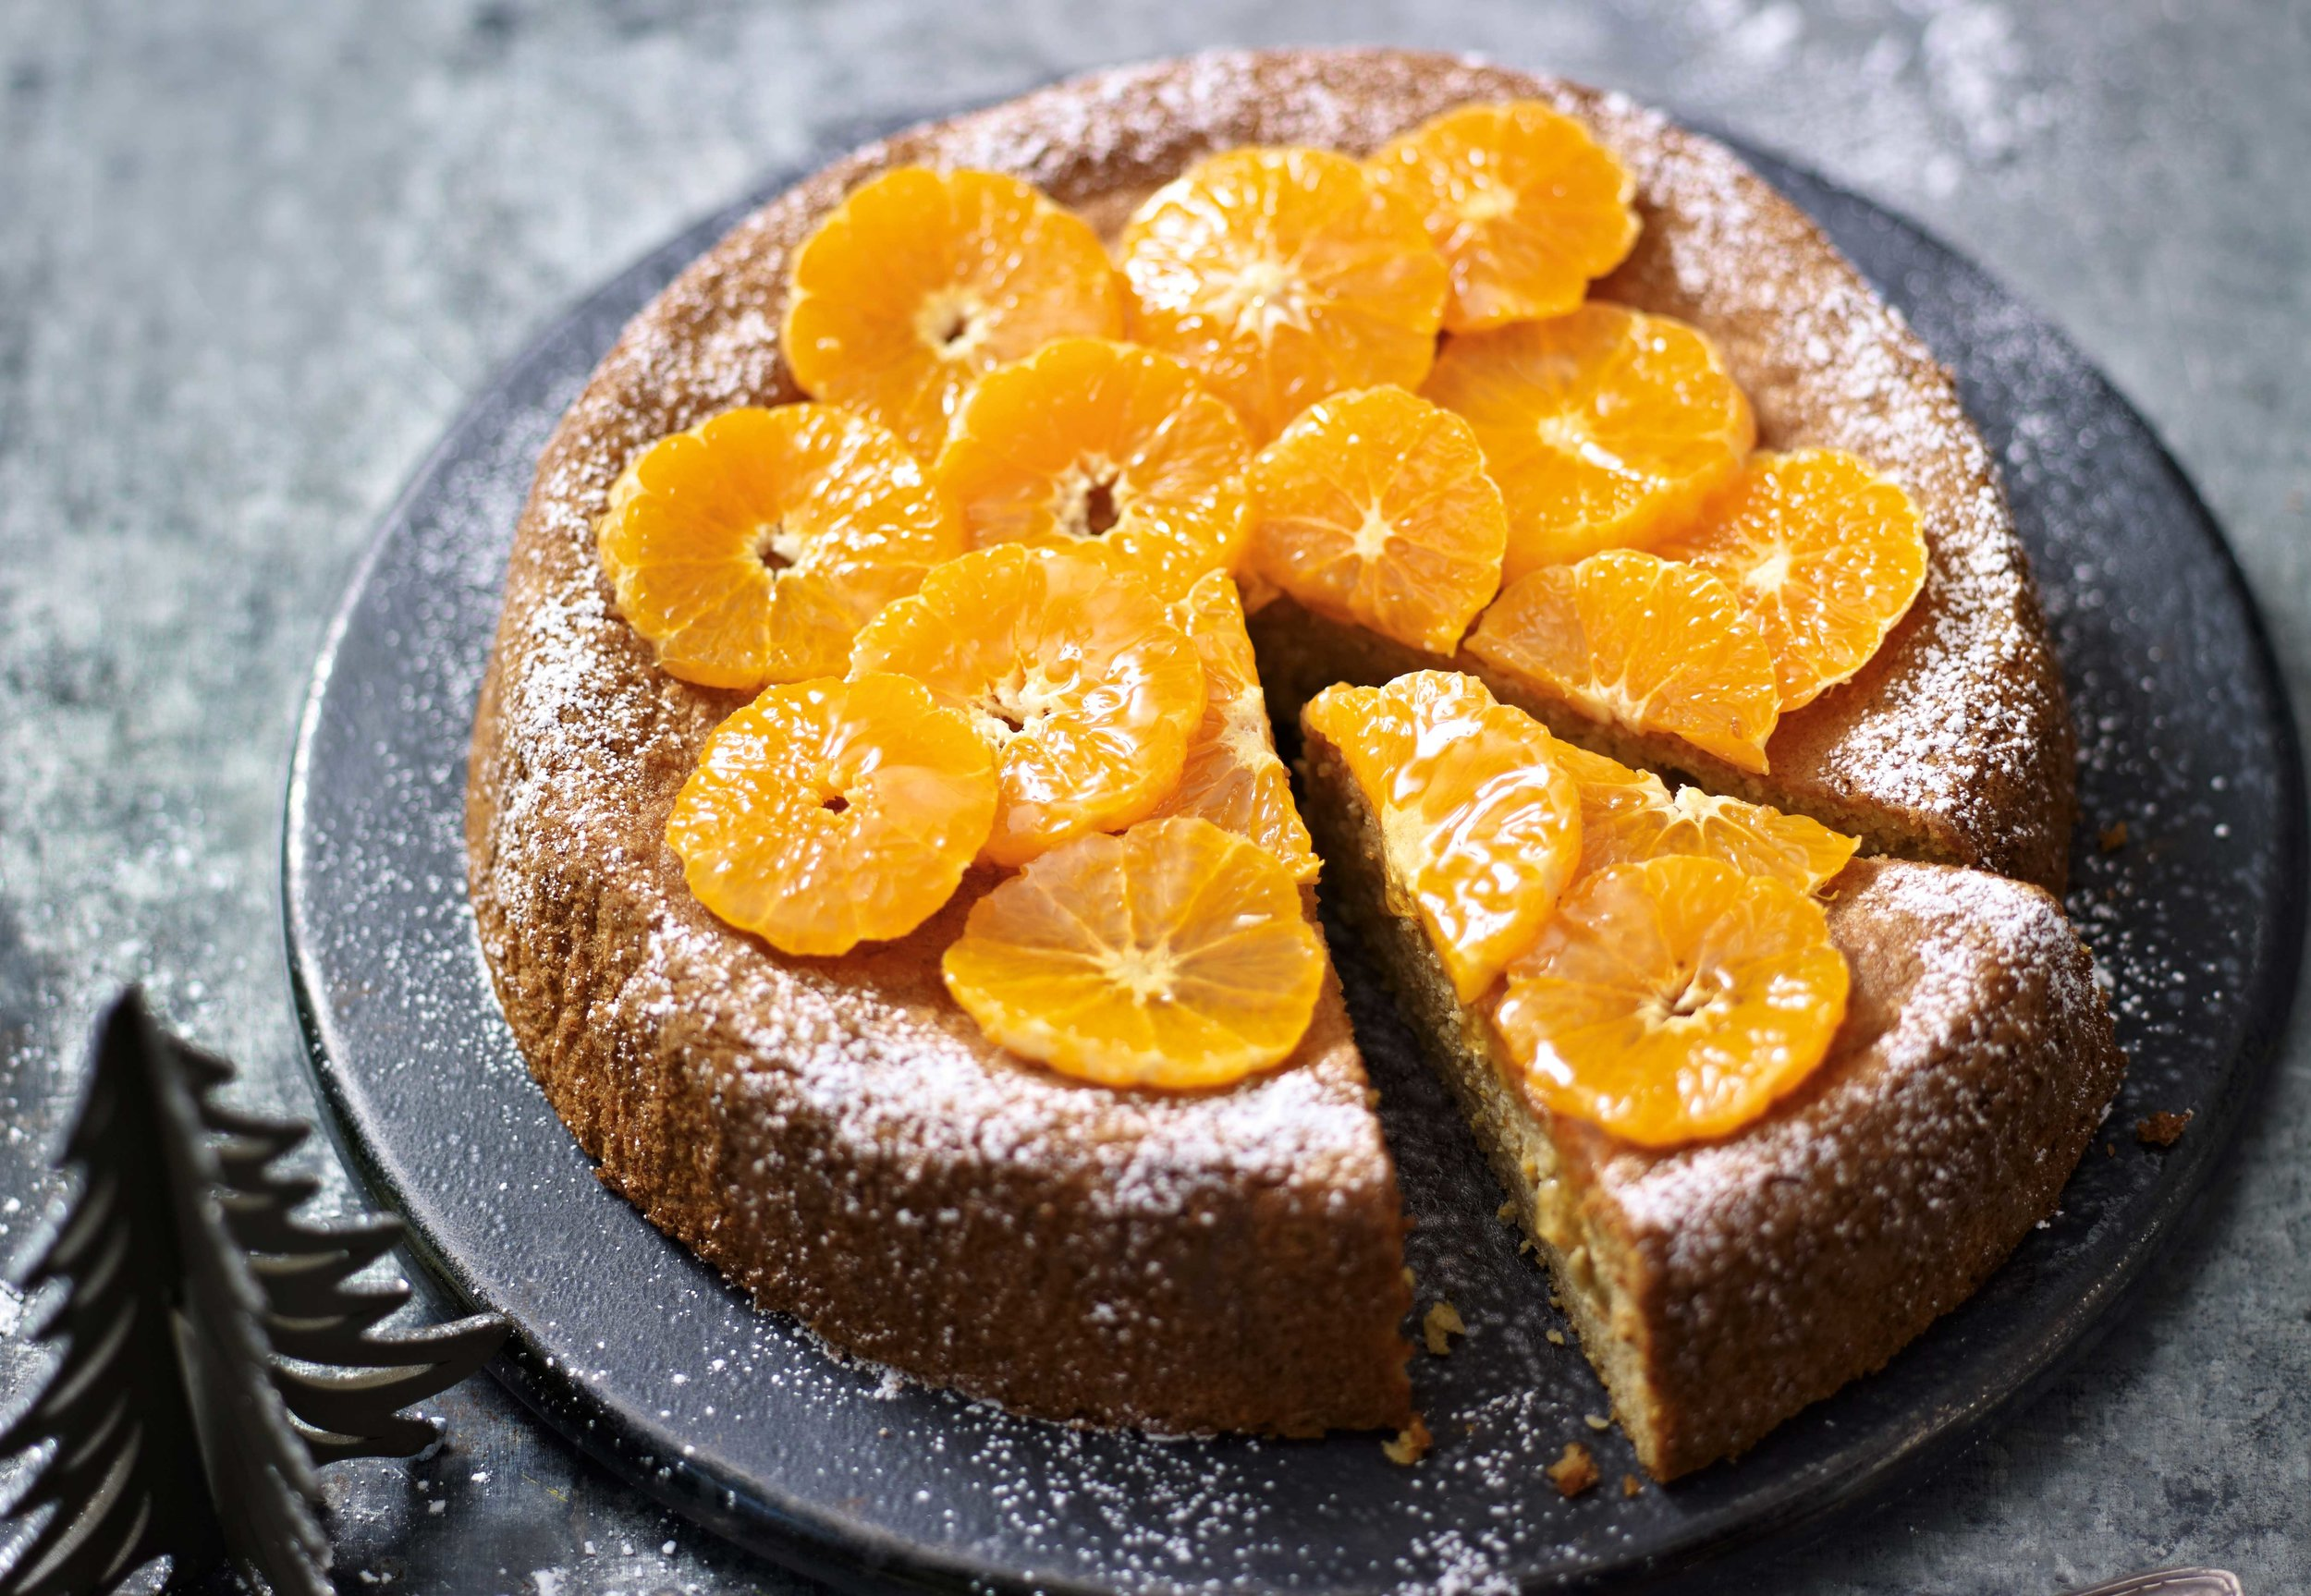 Spiced-orange-&-almond-cake.jpg